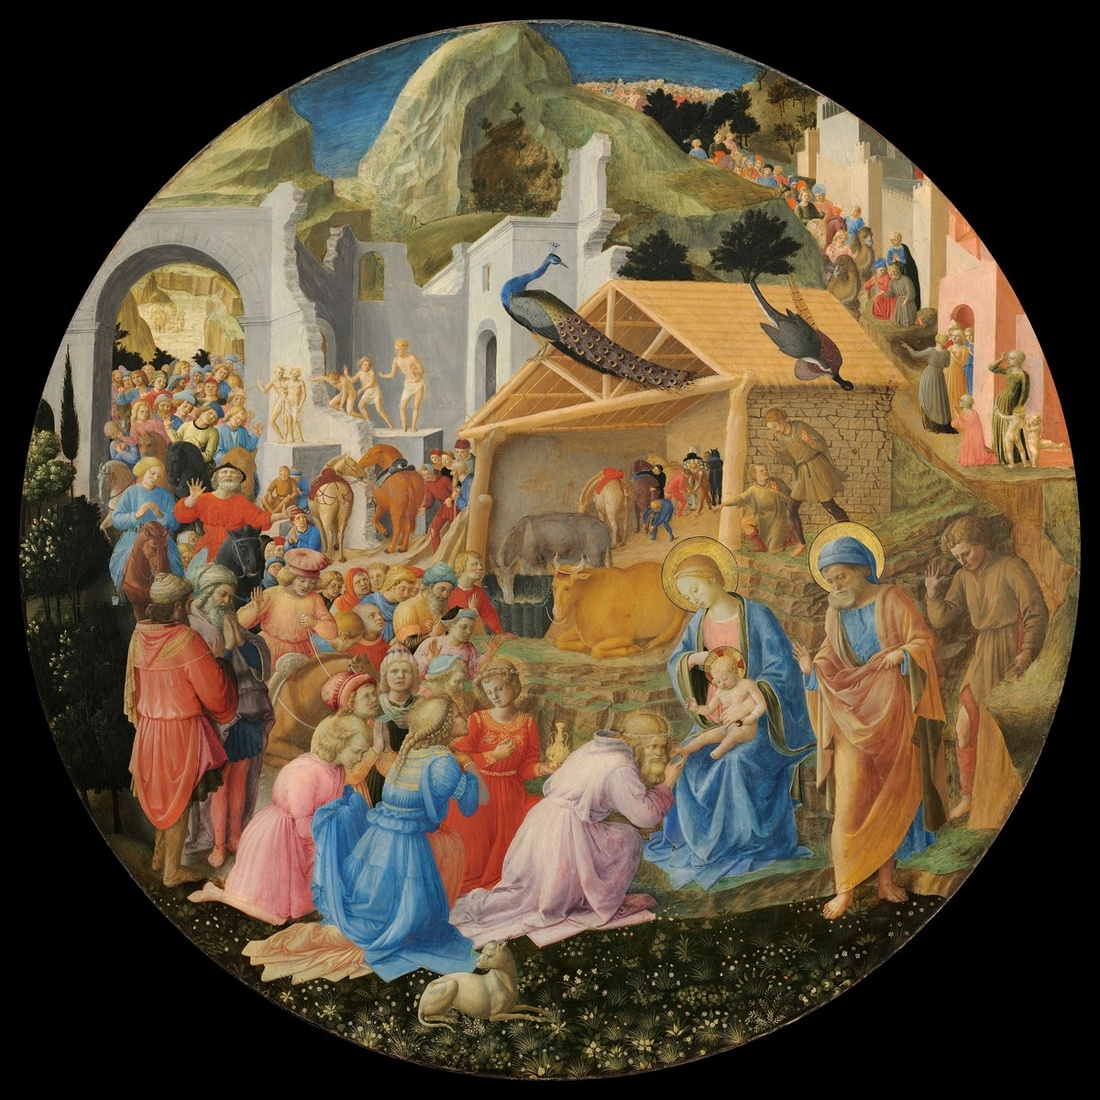 Fra Angelico and Fra Filippo Lippi, The Adoration of the Magi, c. 1440-60. Image via Wikimedia Commons.